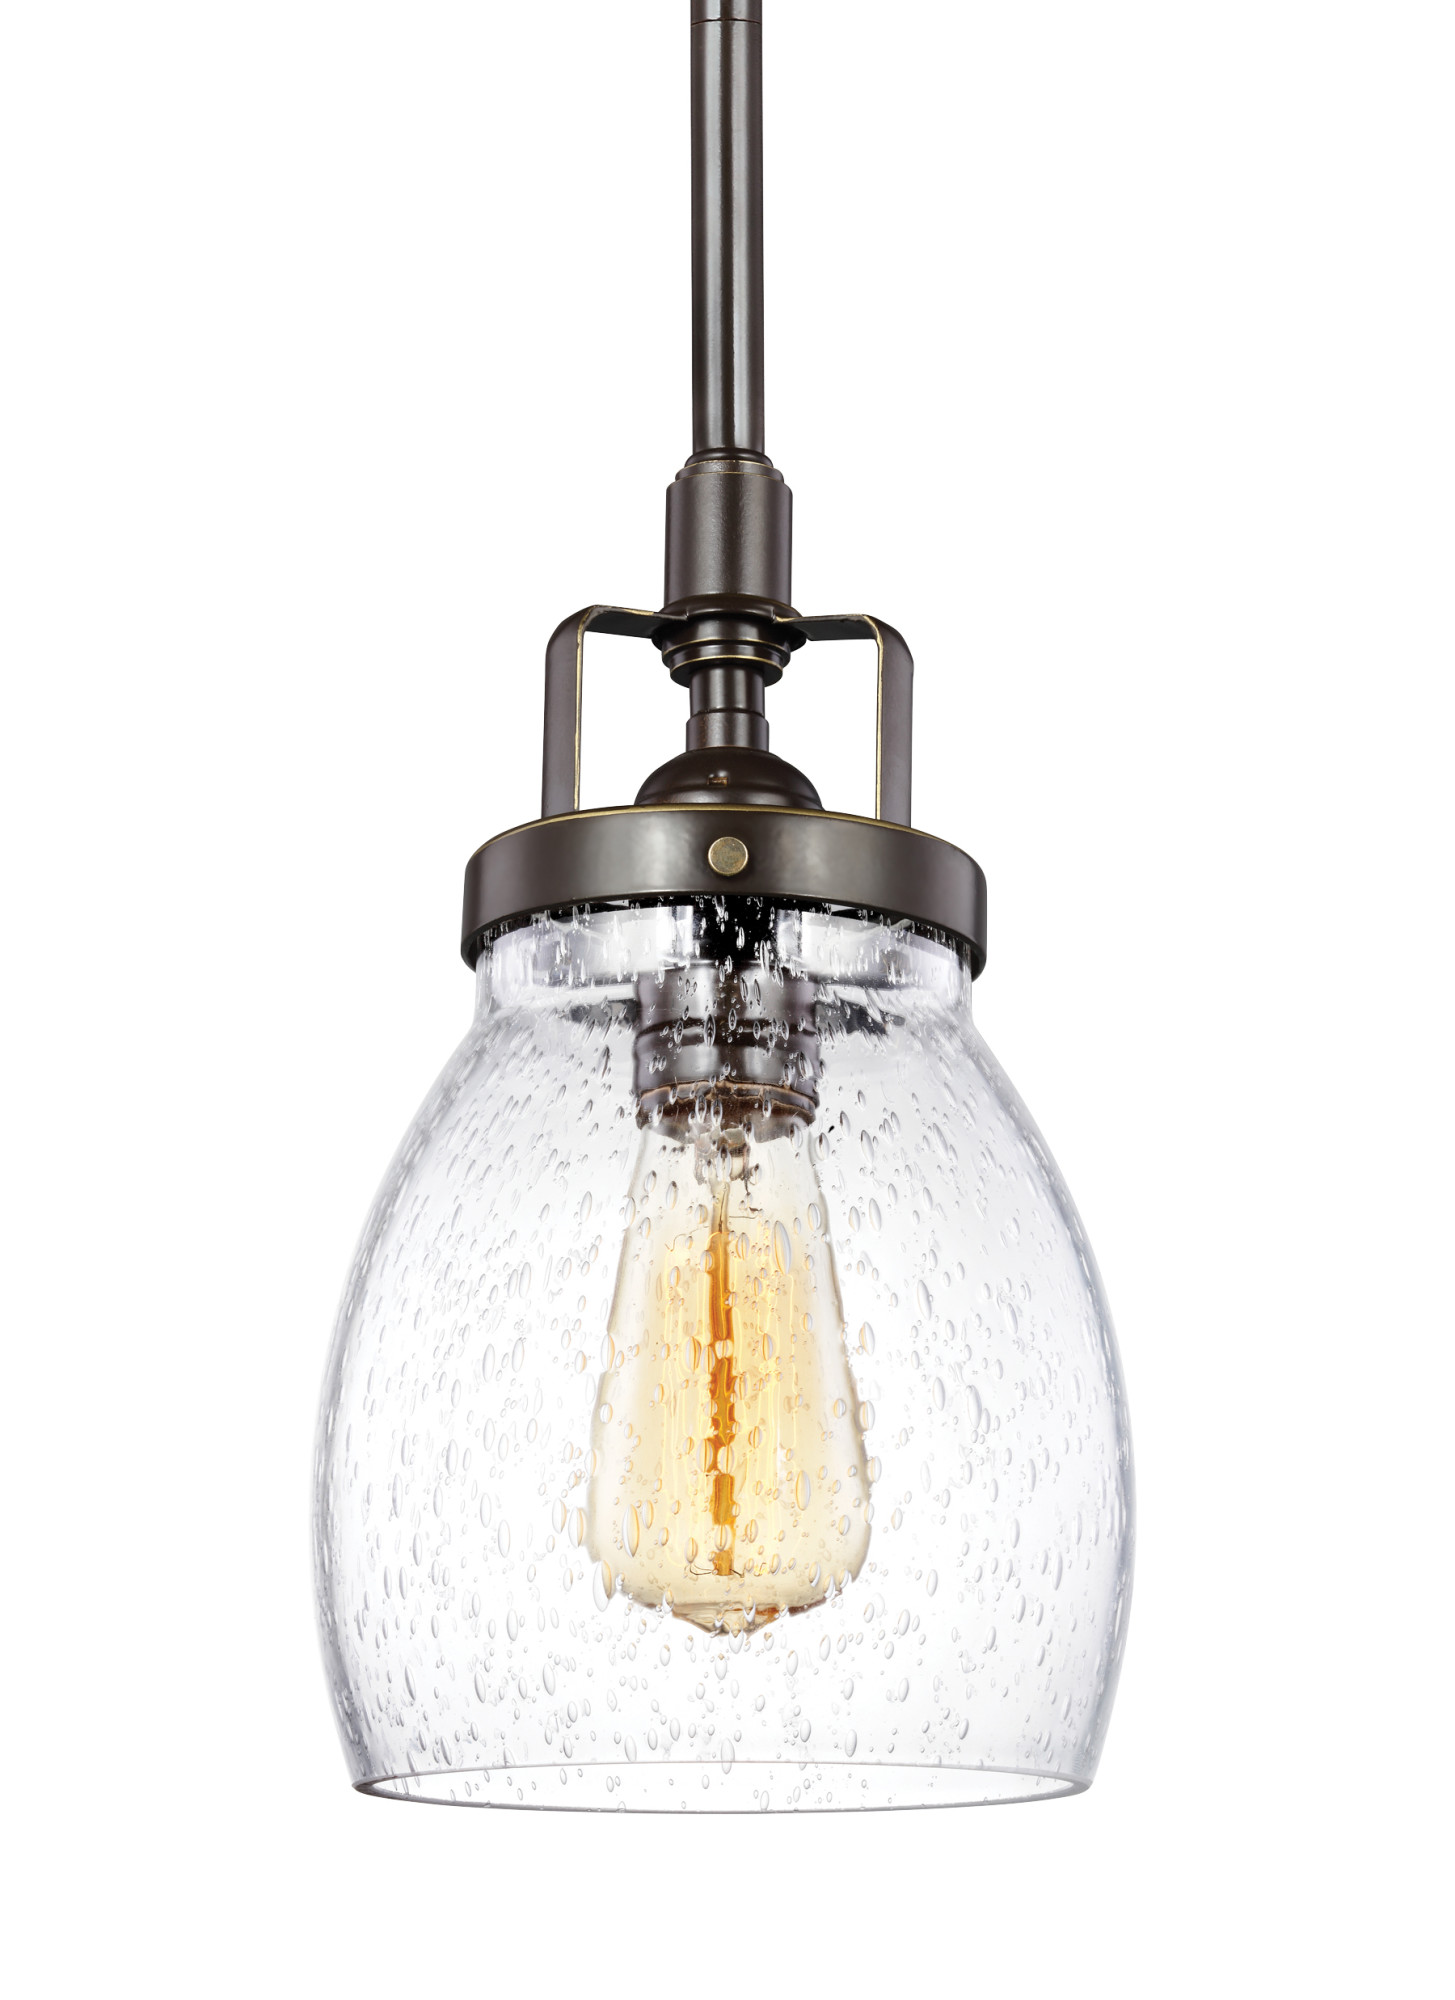 sea gull lighting 6114501 belton 1 light 5 3 8 wide mini pendant walmart com